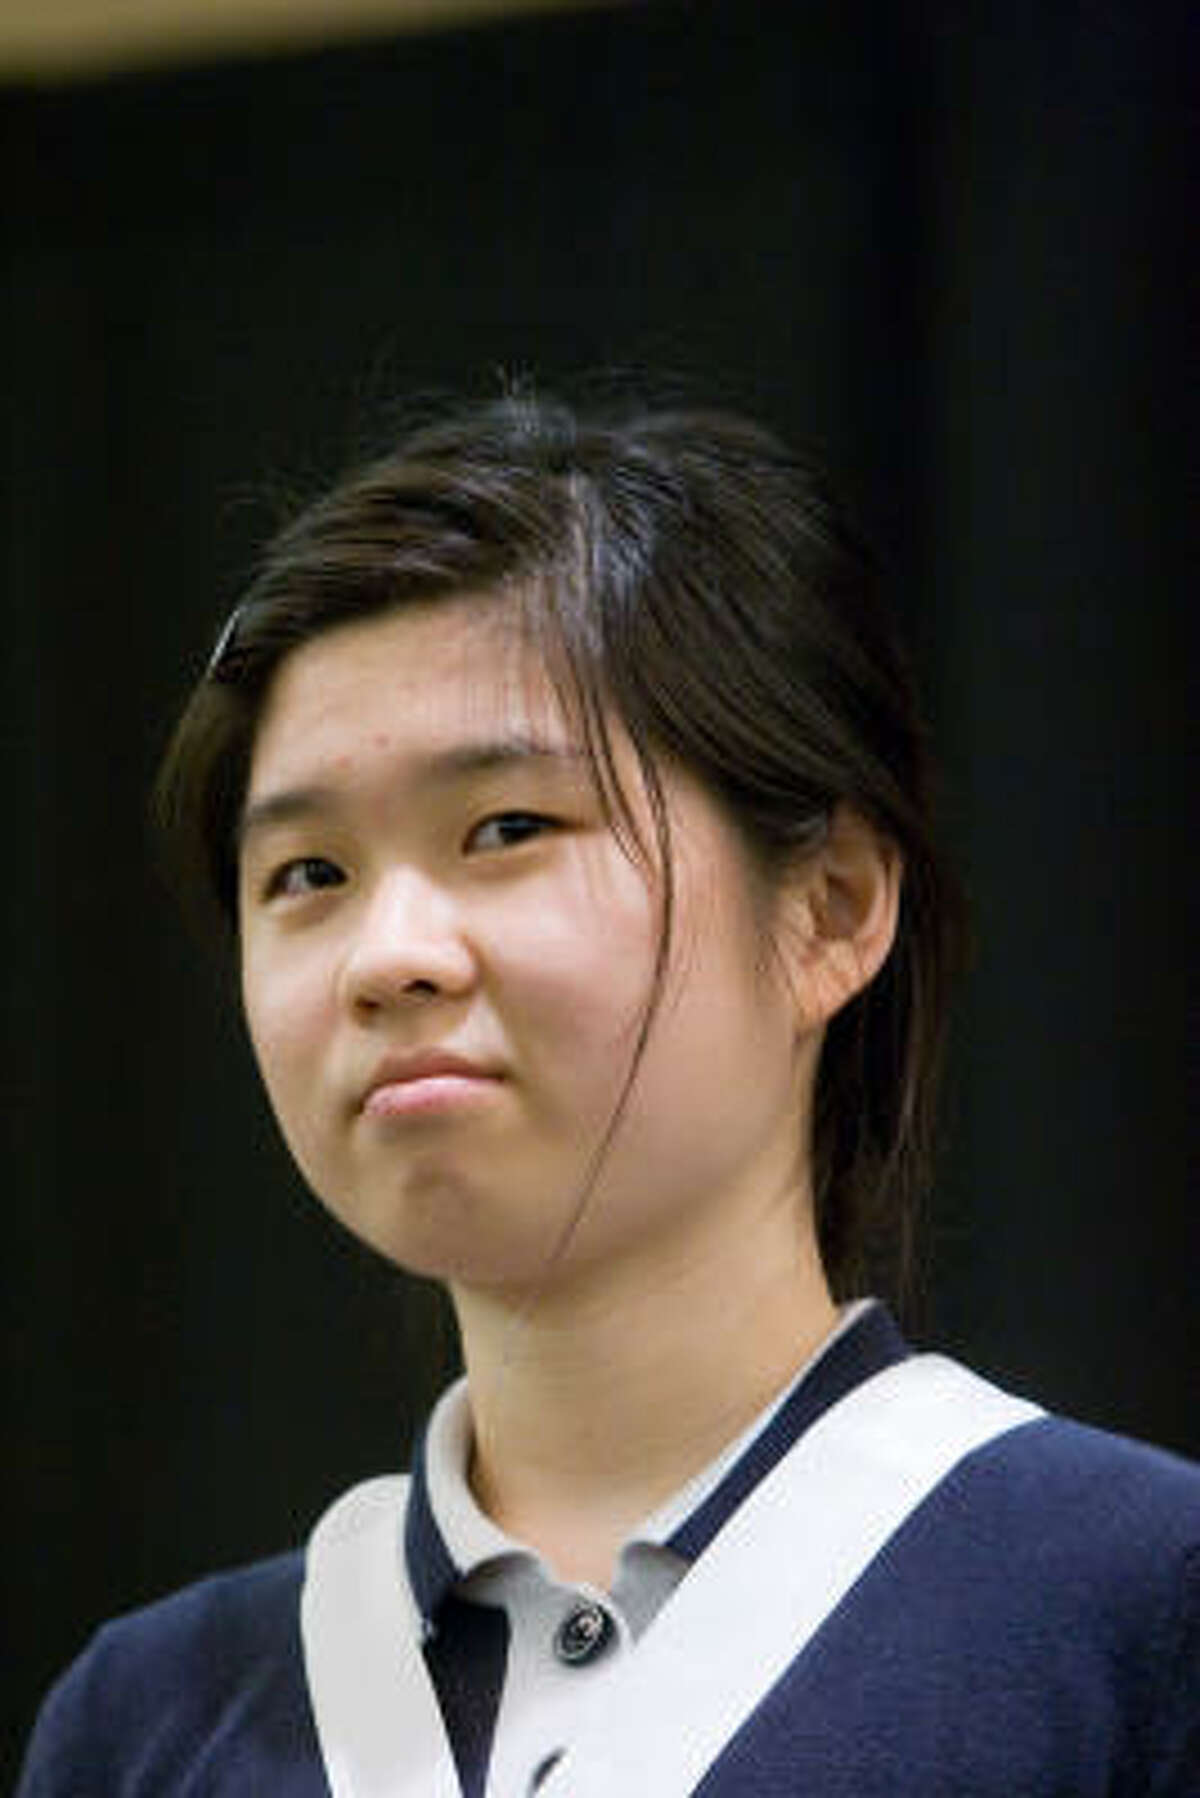 Shanna Chu, Bellaire High School Class rank: Valedictorian; College: Princeton University